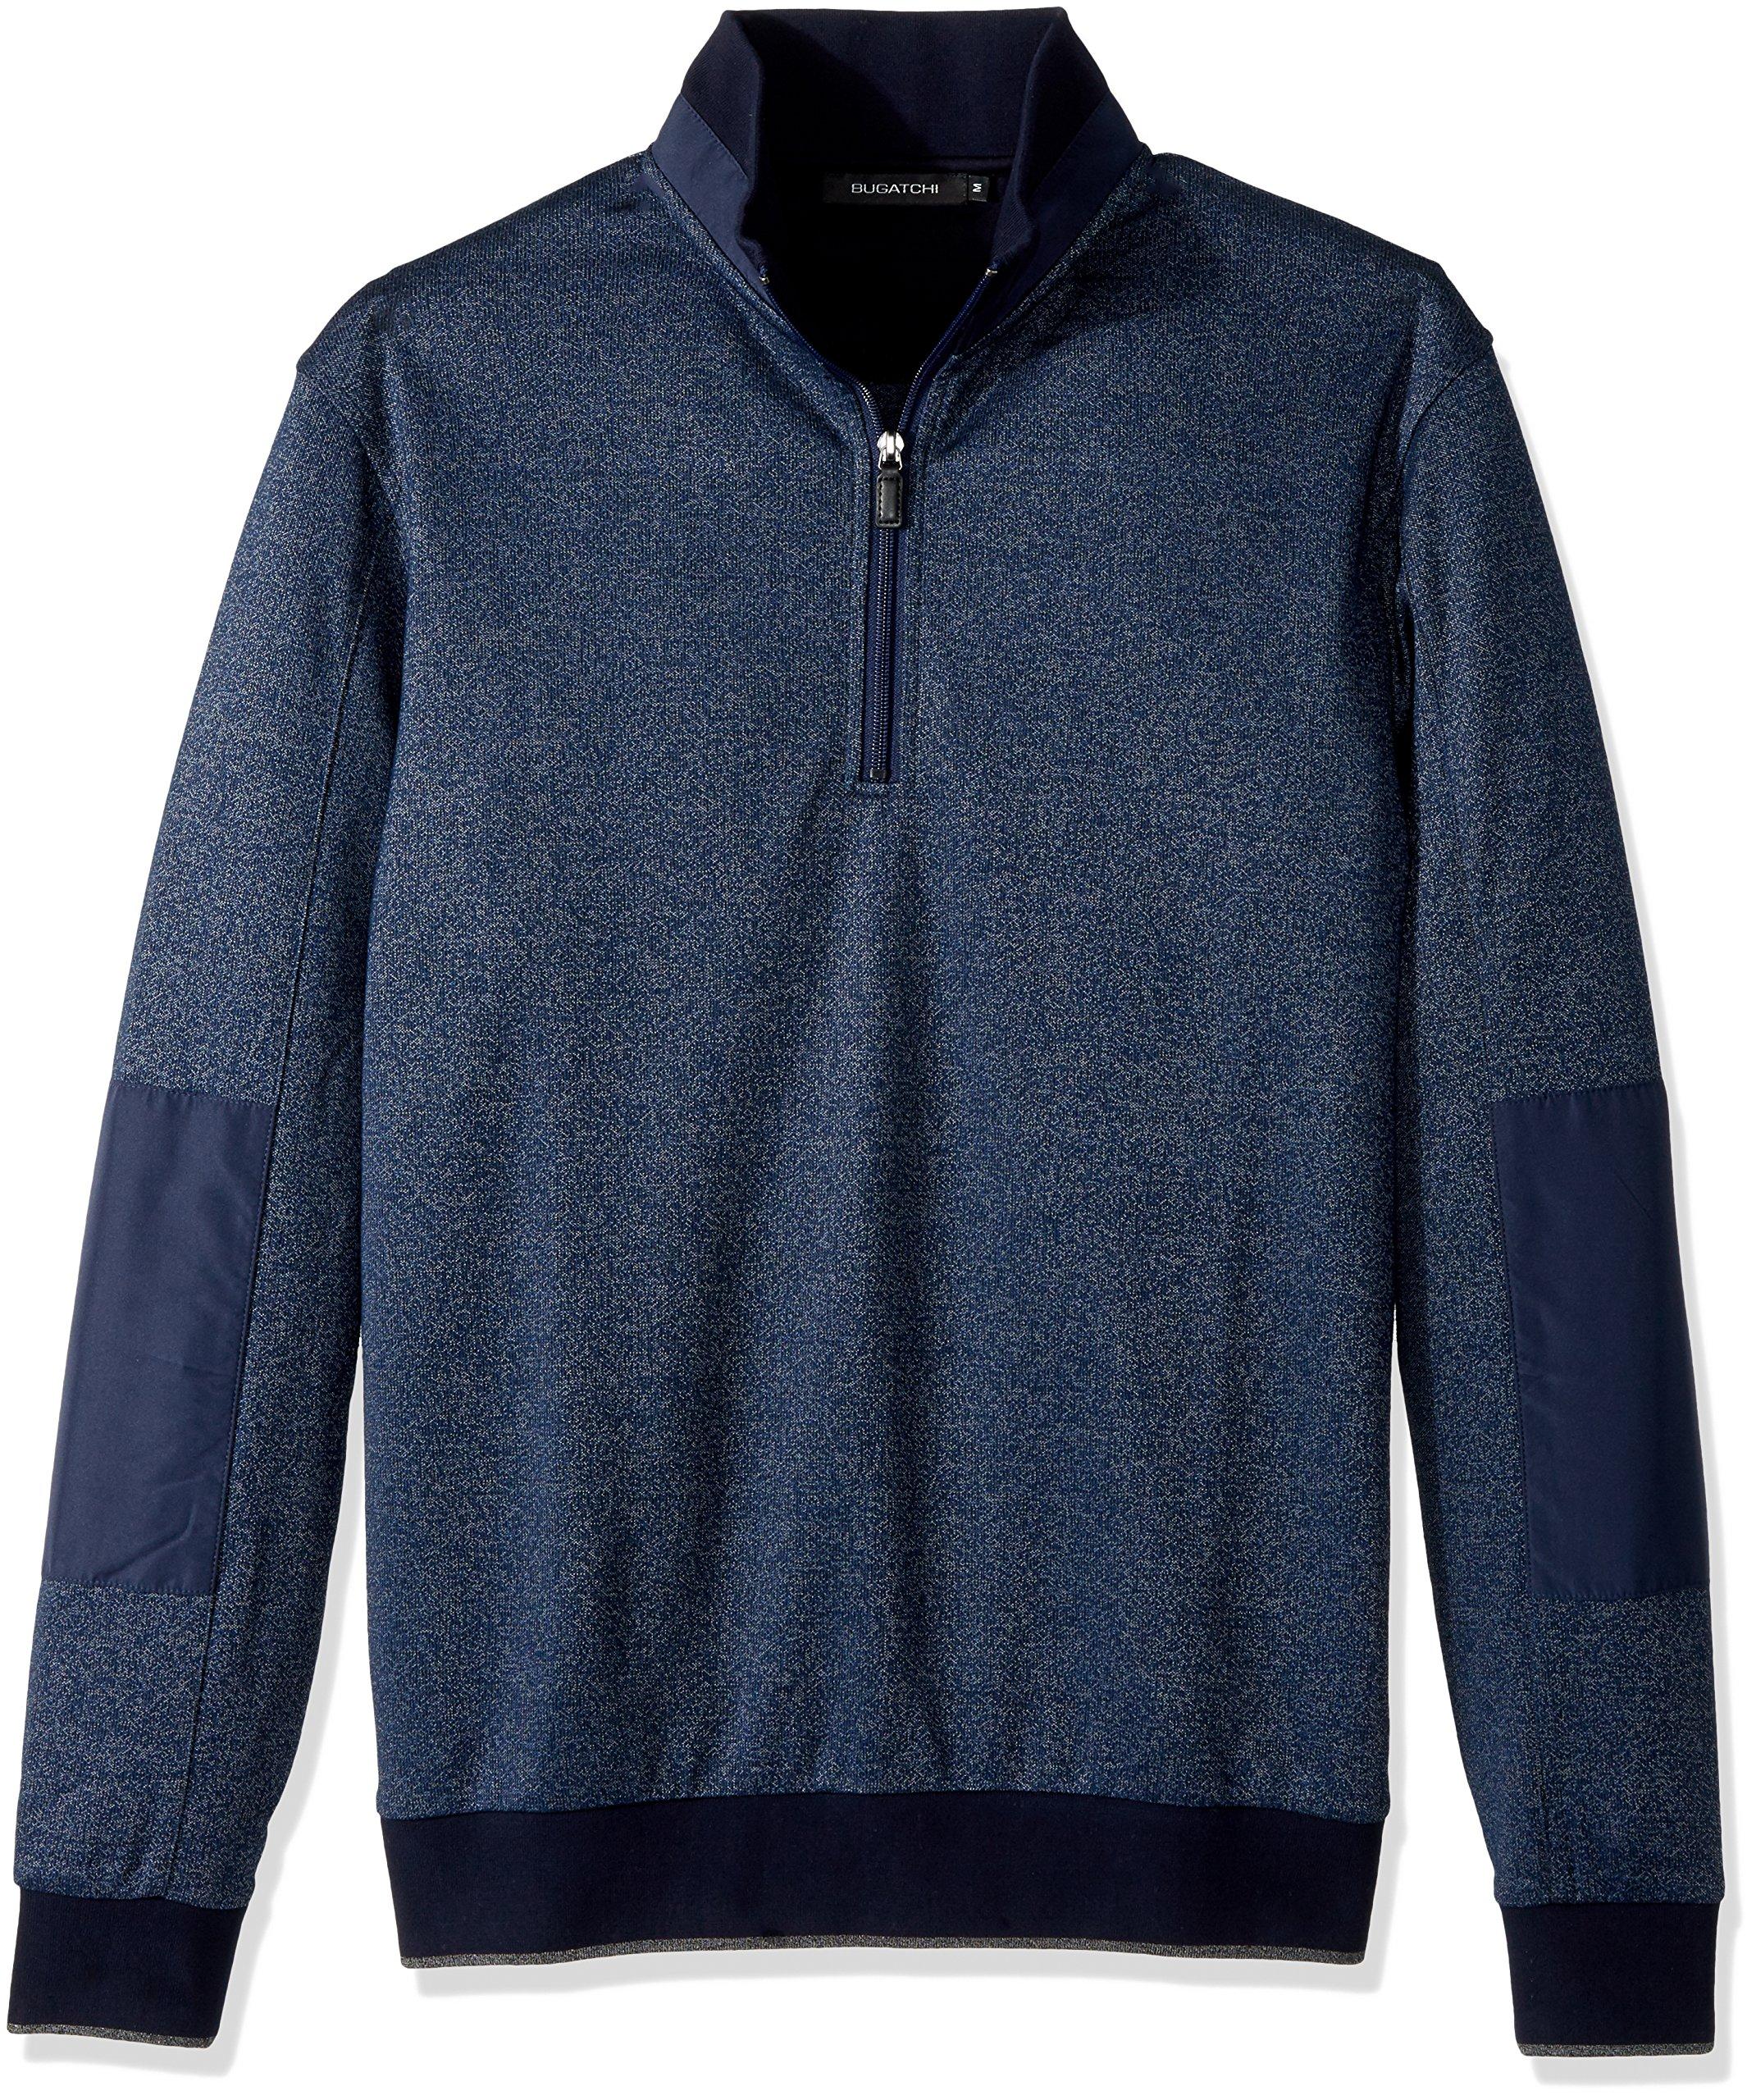 BUGATCHI Men's Cotton Long Sleeve Half Zip Mock Neck Knits, Navy, X-Large